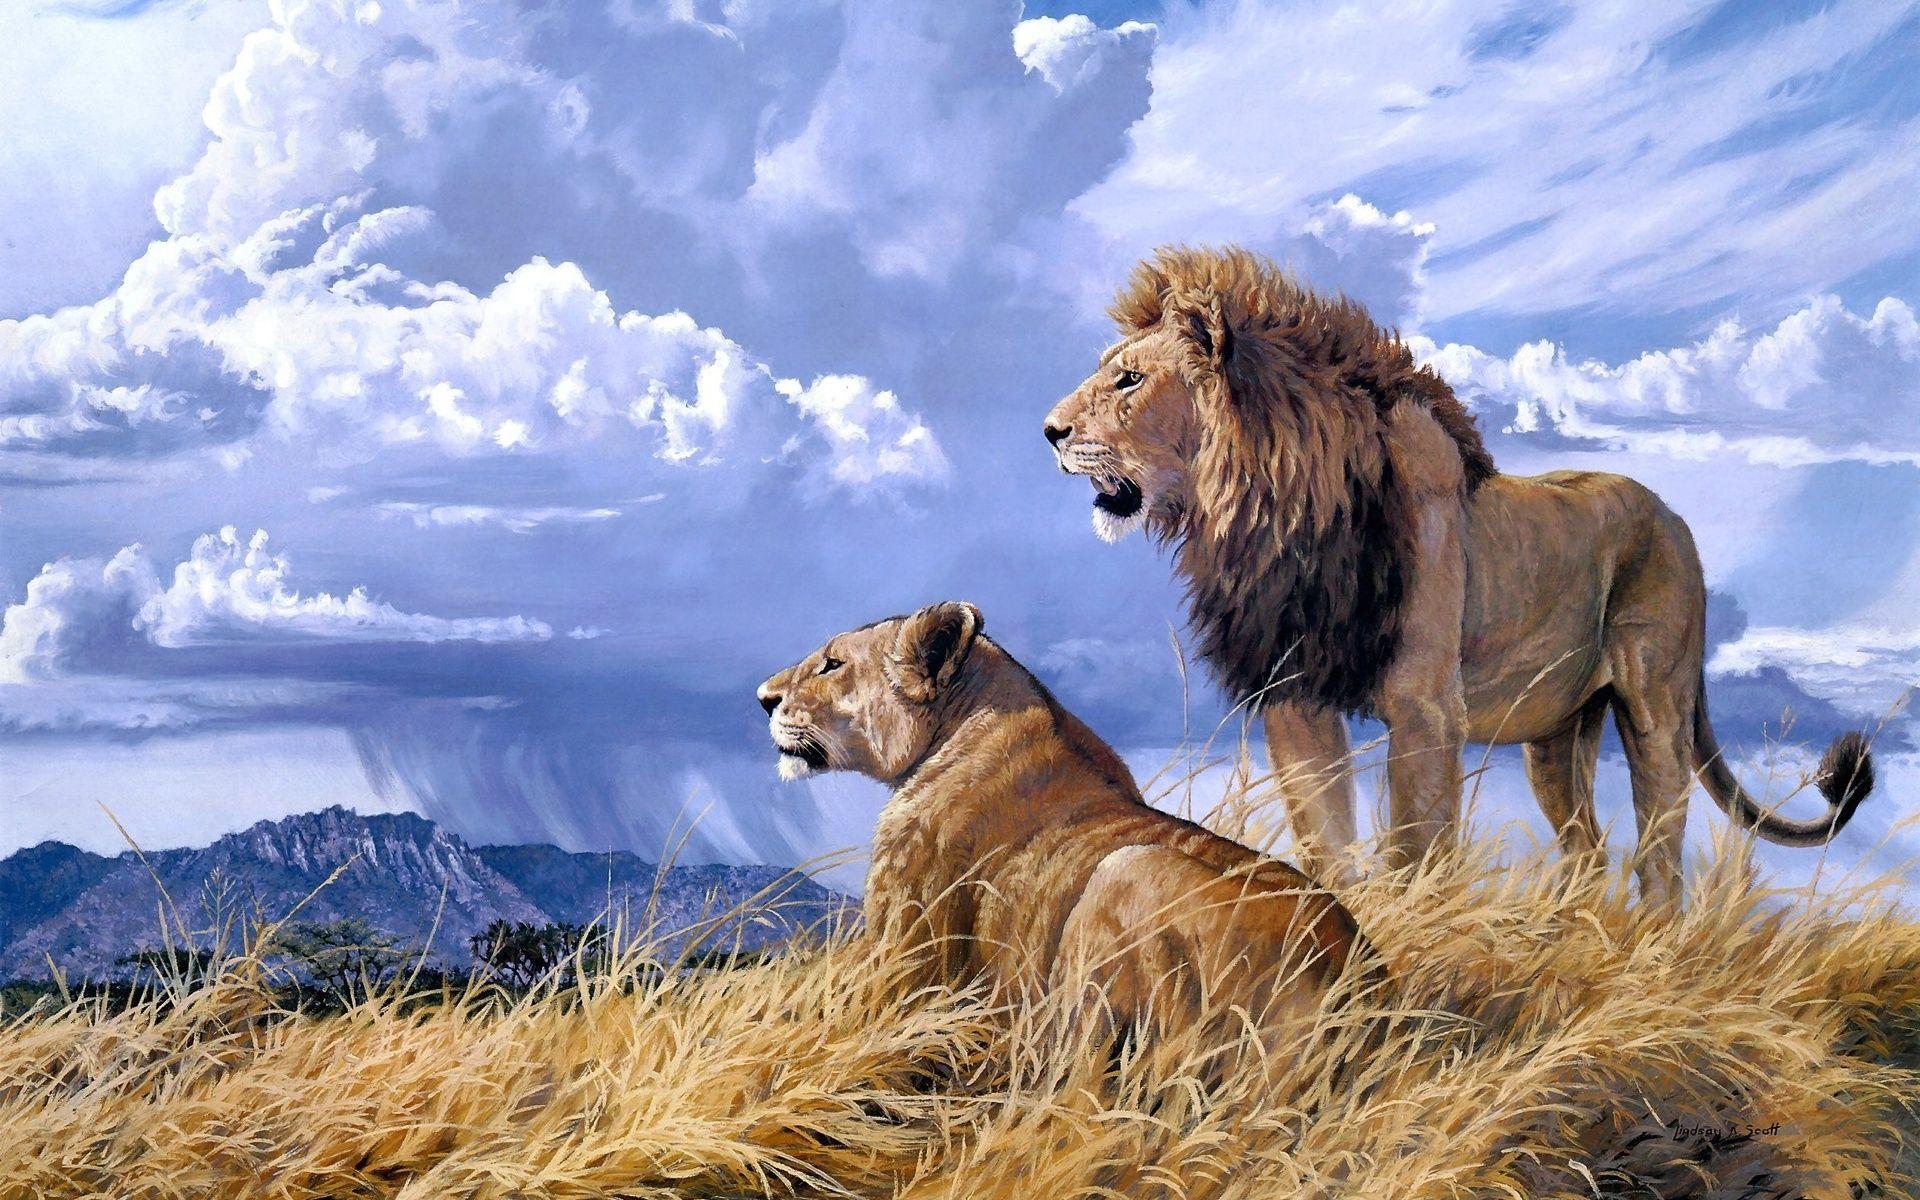 Beautiful Nature And Animal Wallpaper Lion Wallpaper Lion Couple Lion Hd Wallpaper